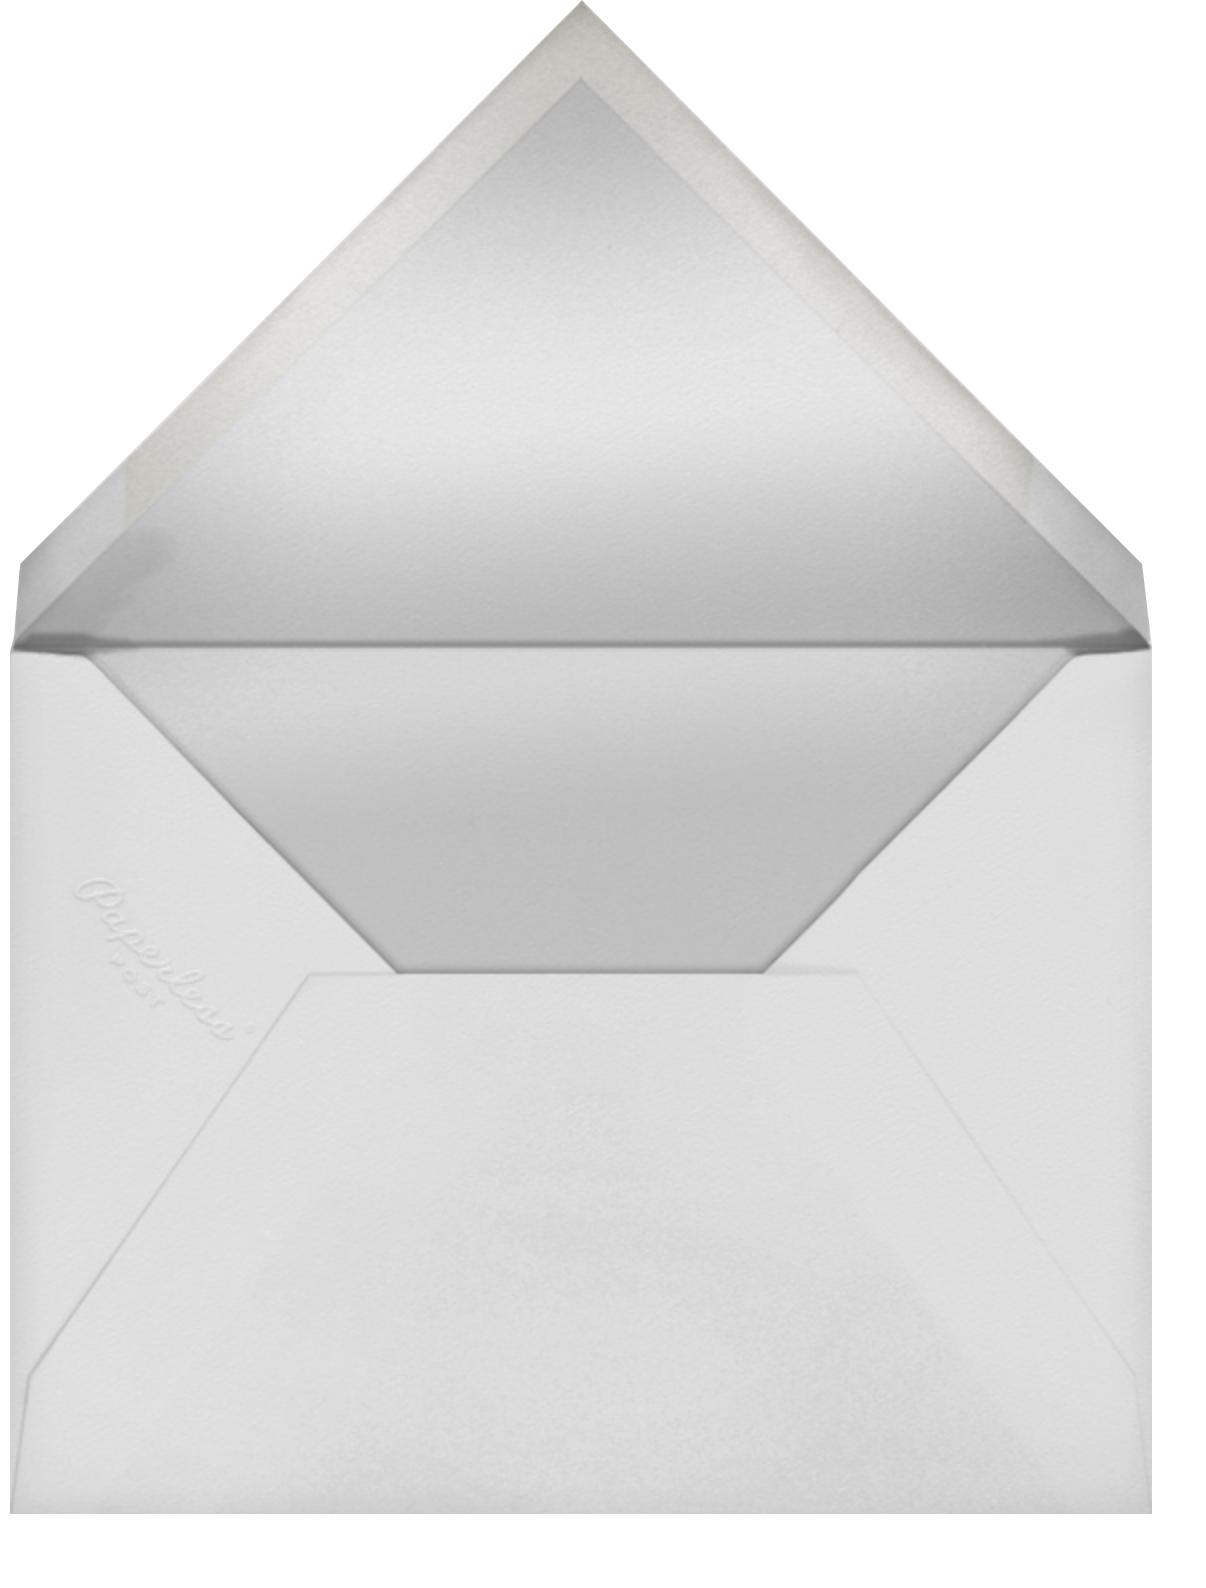 San Francisco Skyline View (Menu) - White/Black - Paperless Post - Menus - envelope back